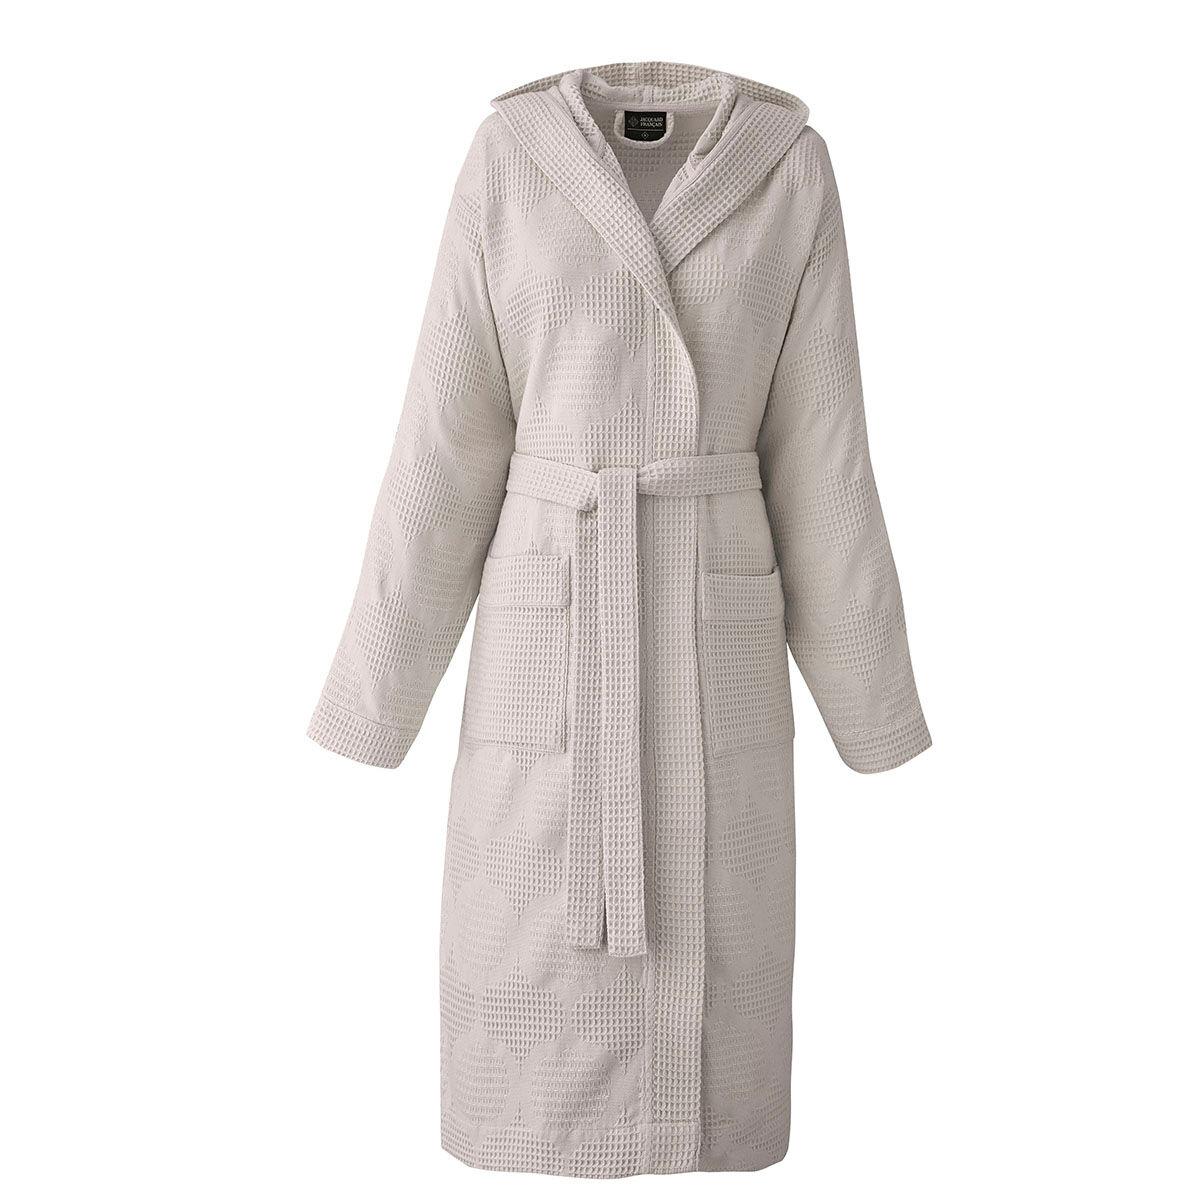 Le Jacquard Franais Peignoir en coton argile XL